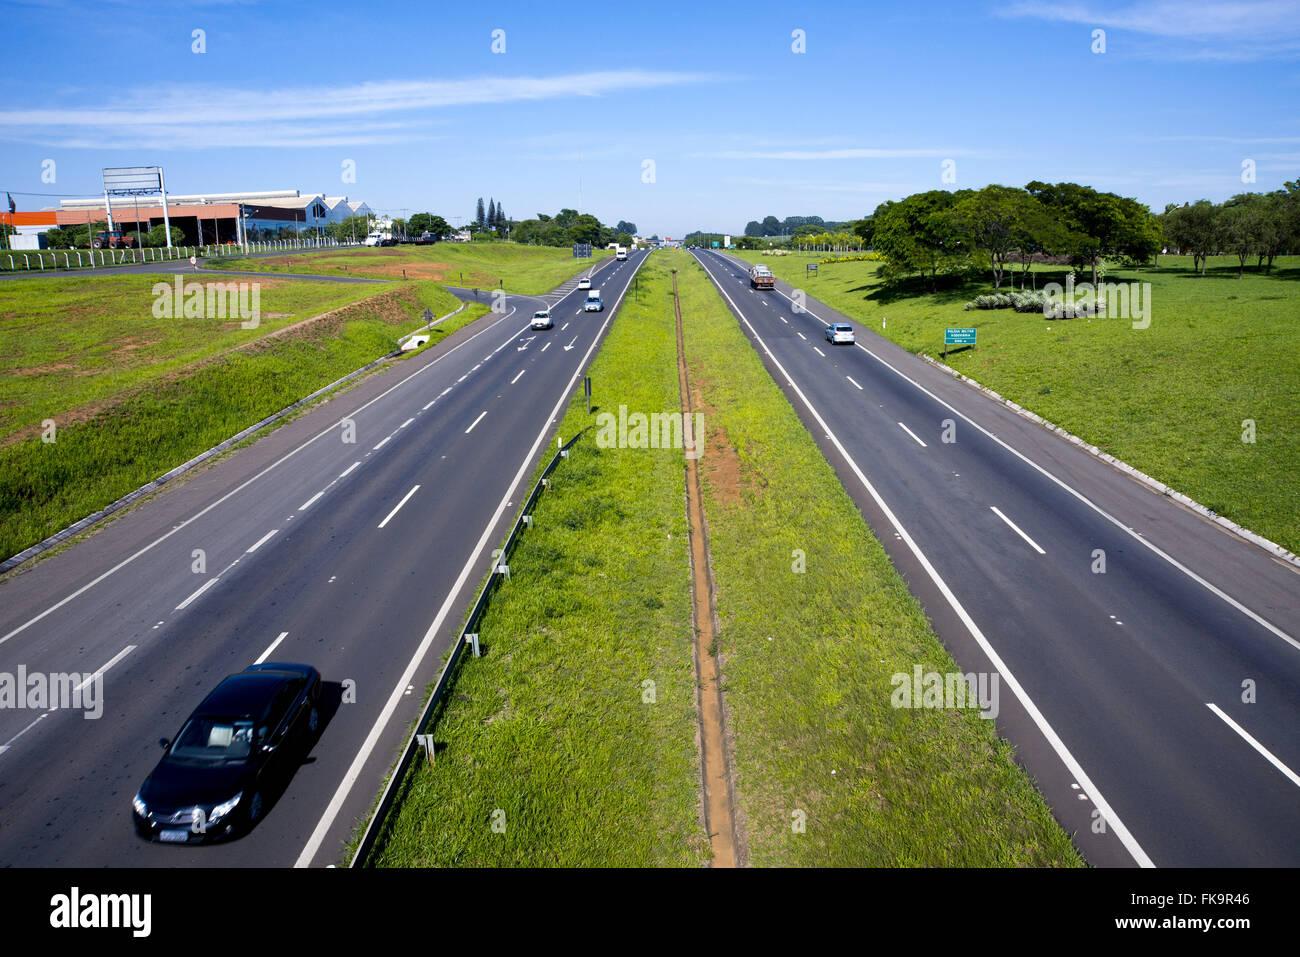 SP-308 Highway of Sugar - Stock Image